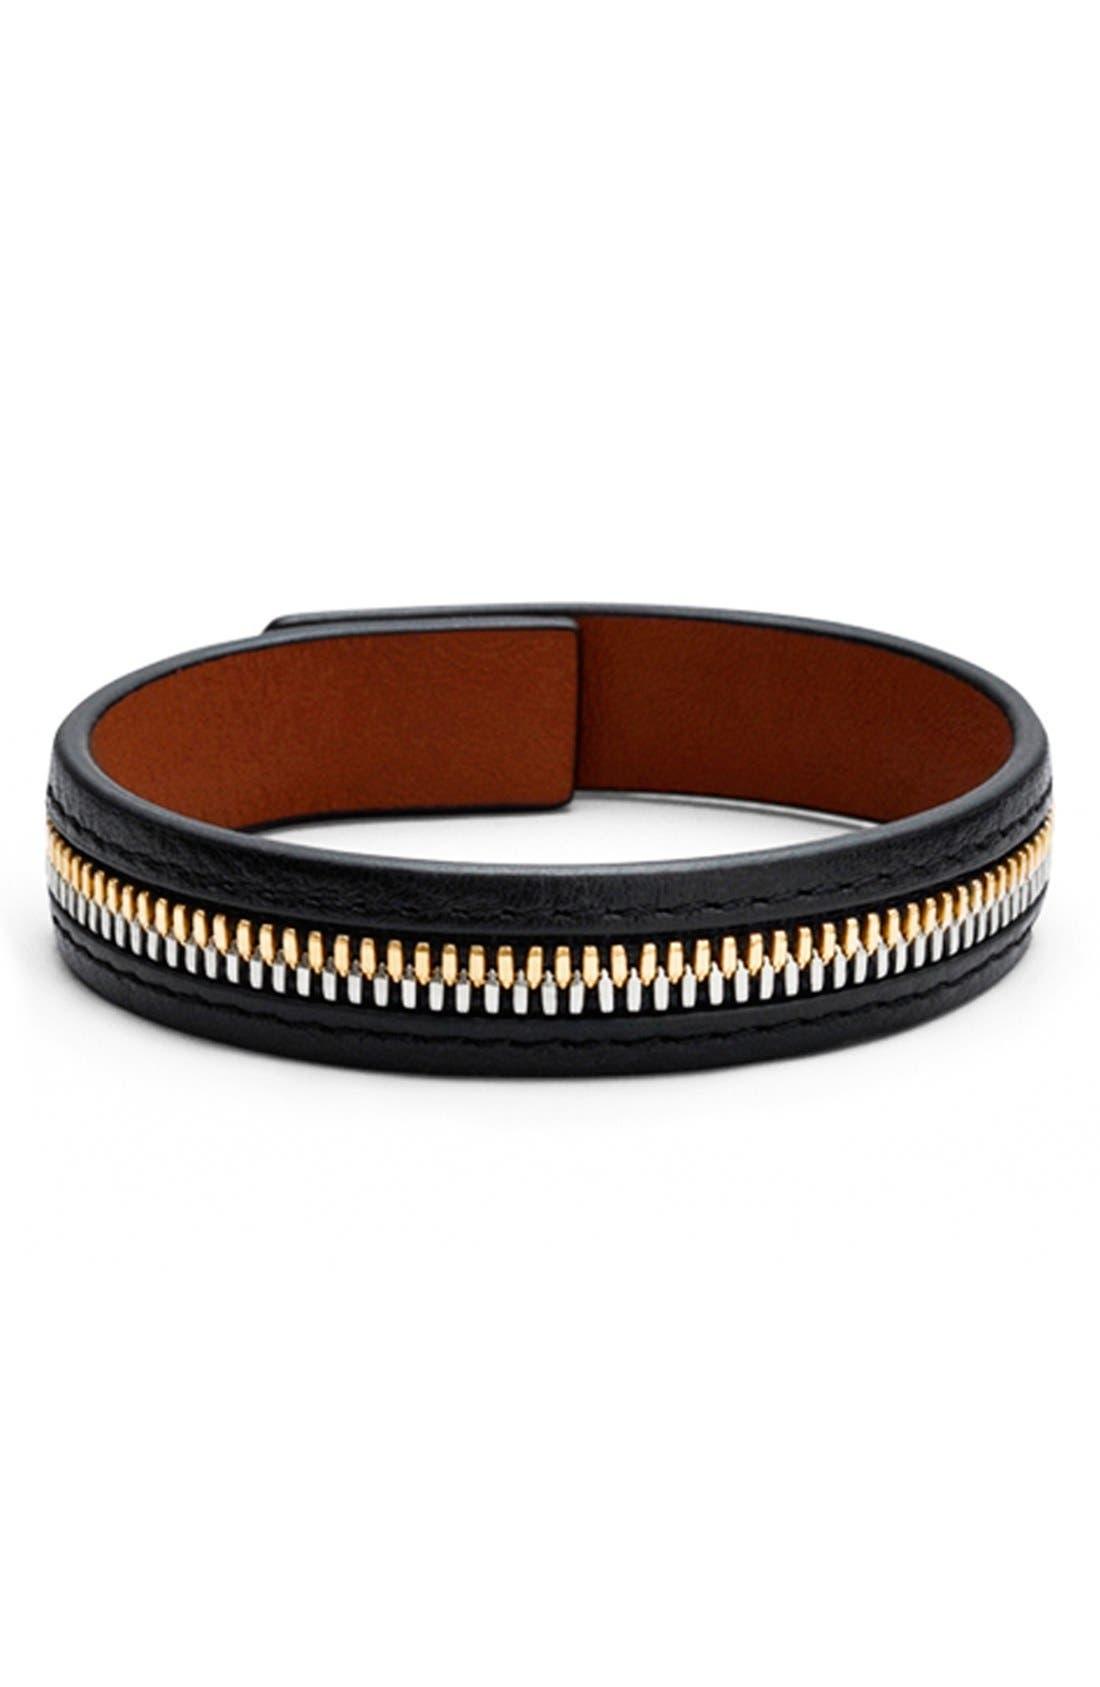 'Tambo' Zip Bracelet,                             Alternate thumbnail 2, color,                             Black/ Cognac